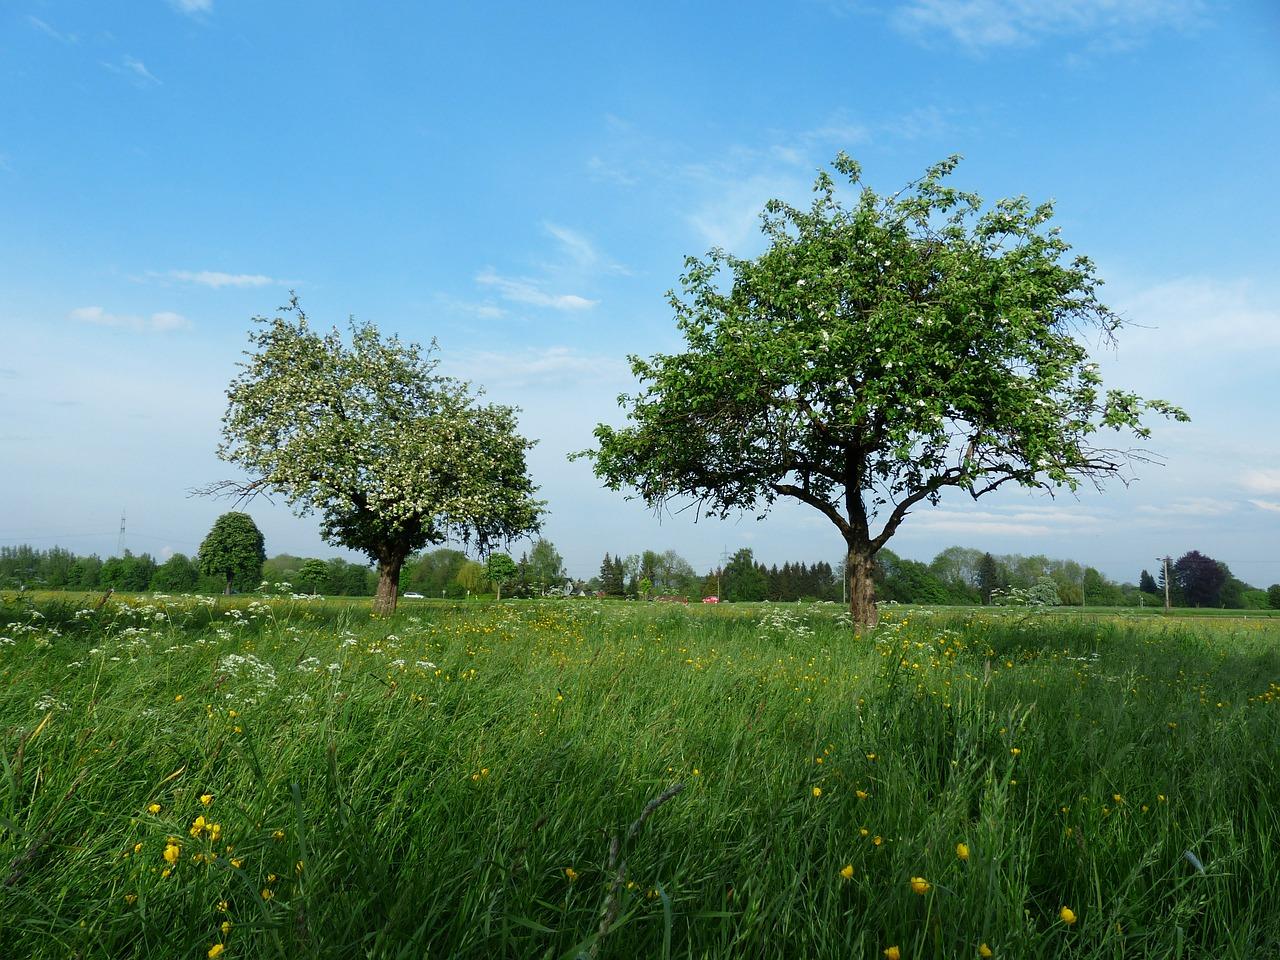 Obstsortengarten der Stadt Cvikov (Město Cvikov)